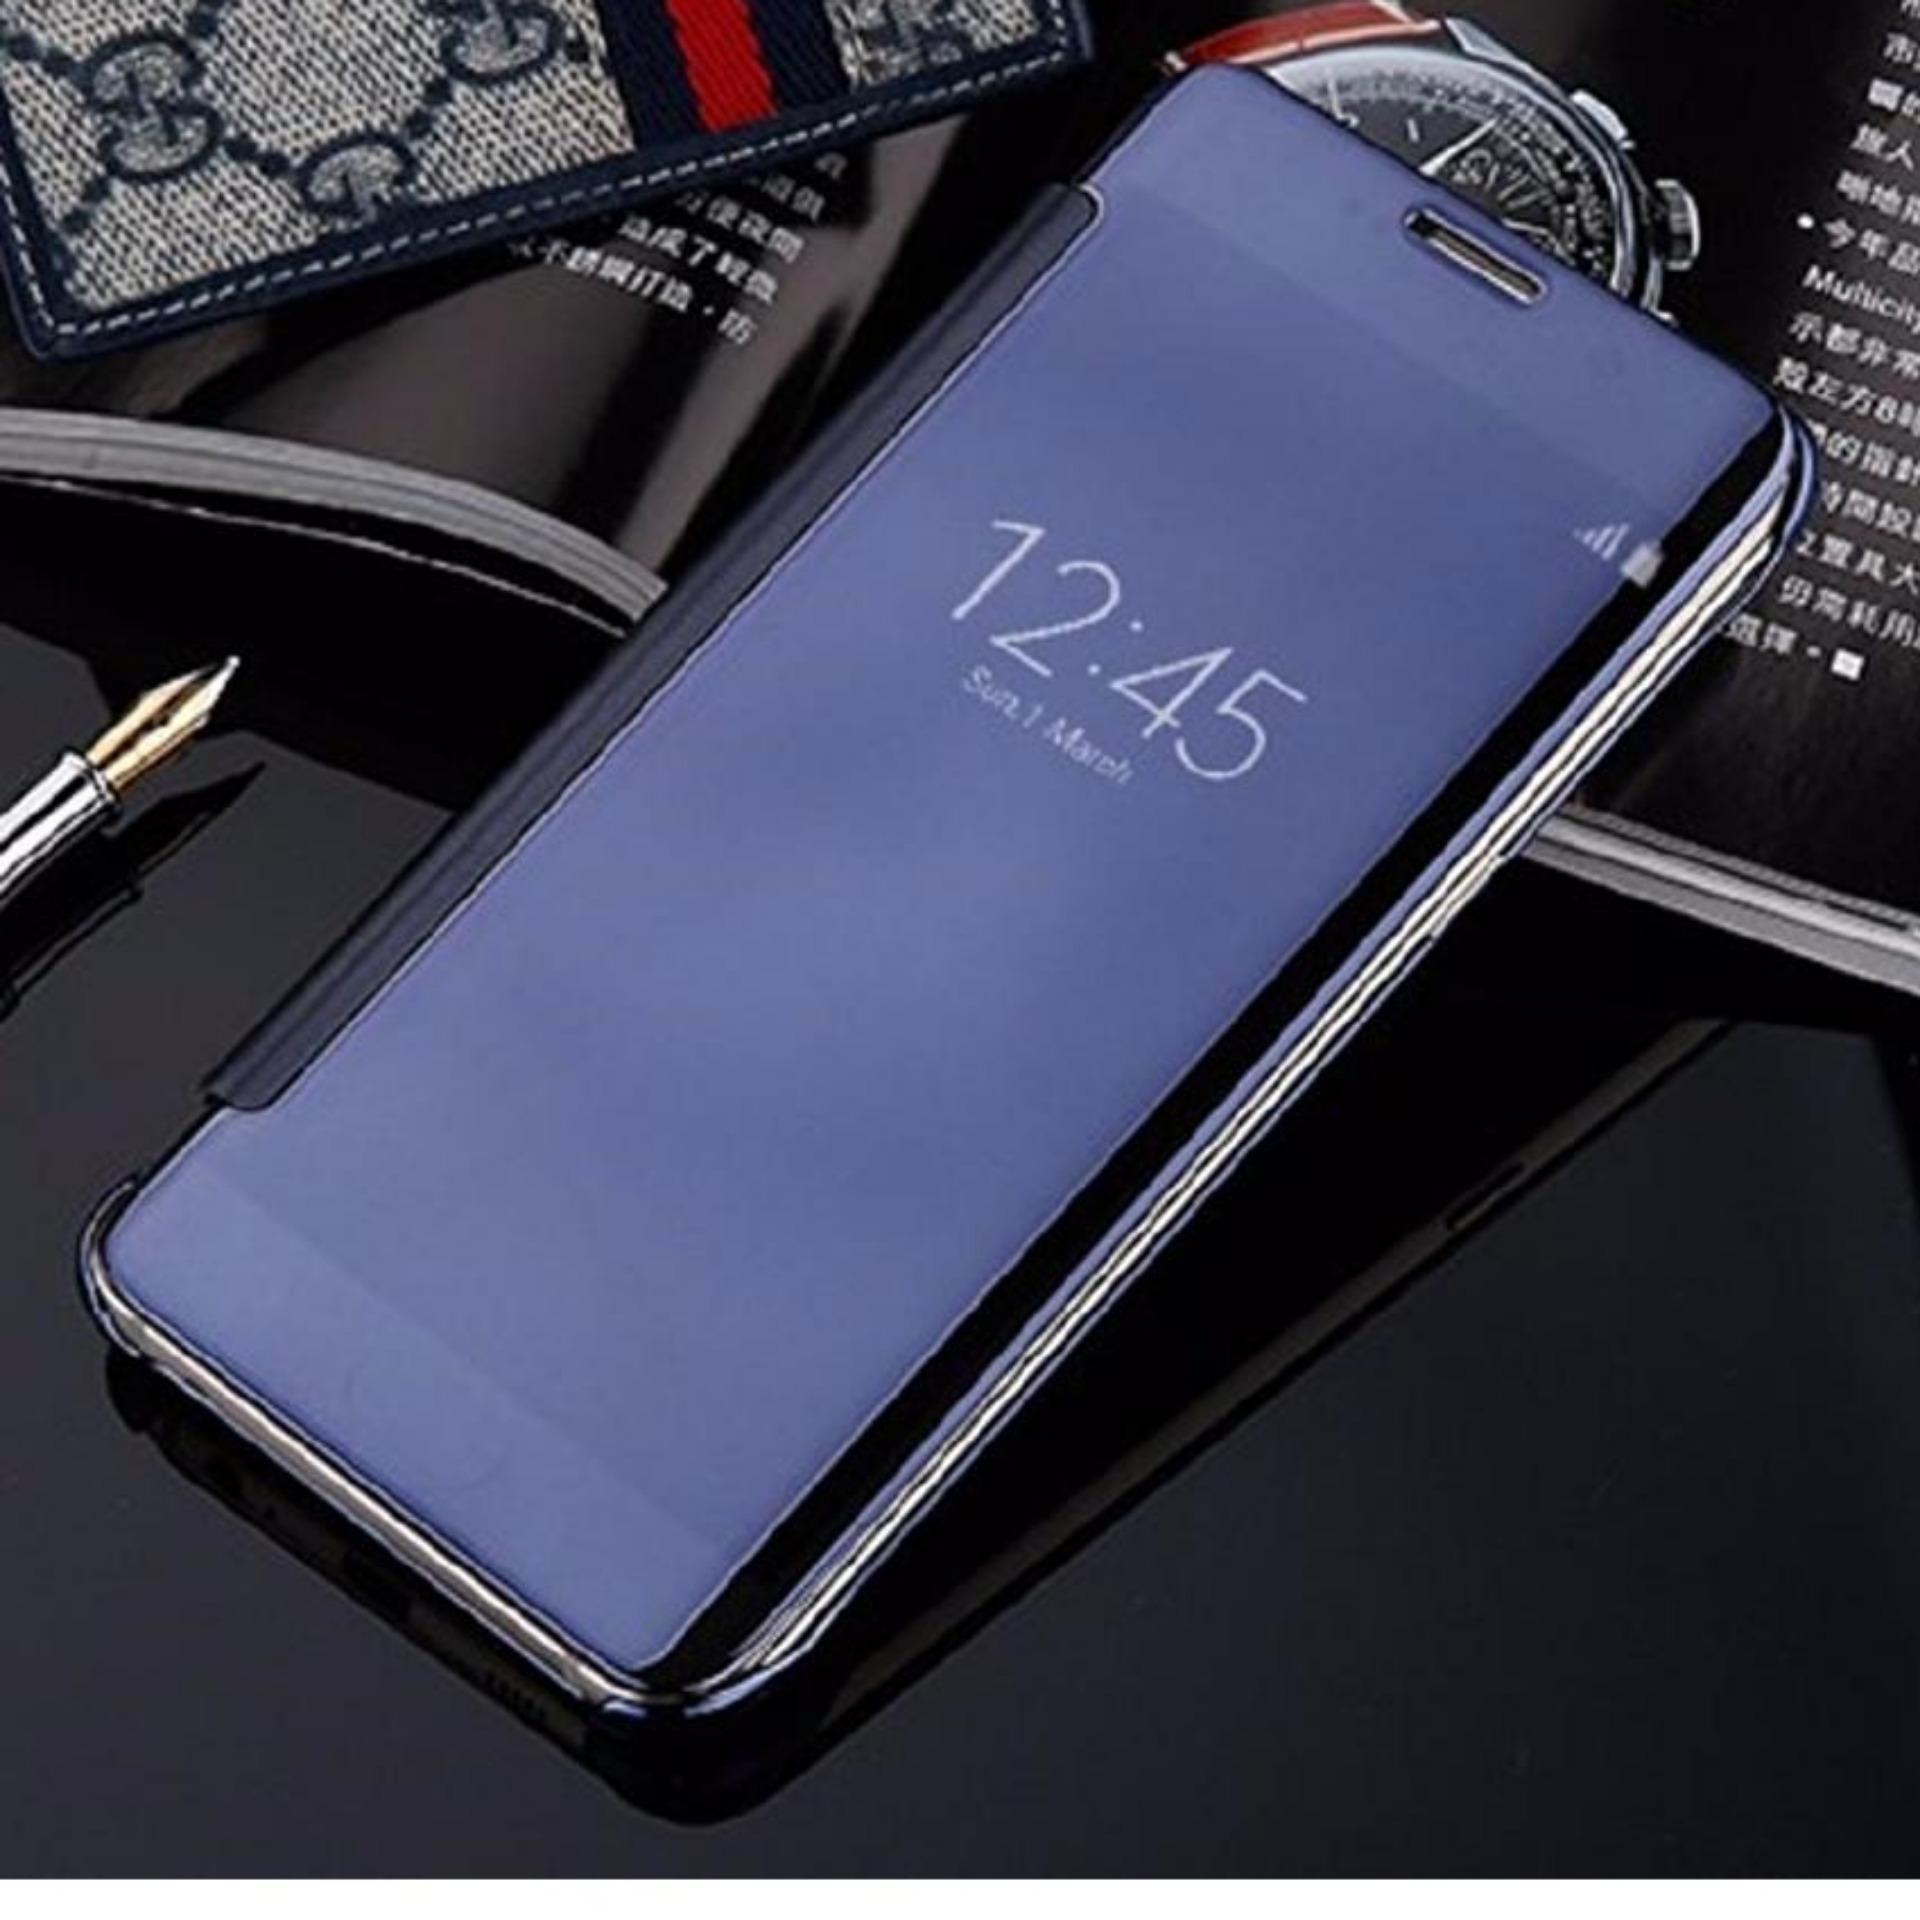 Jual Mnc Case Samsung Galaxy J7 Prime Flipcase Flip Mirror Cover S View Transparan Auto Lock Casing Hp Black Di Dki Jakarta